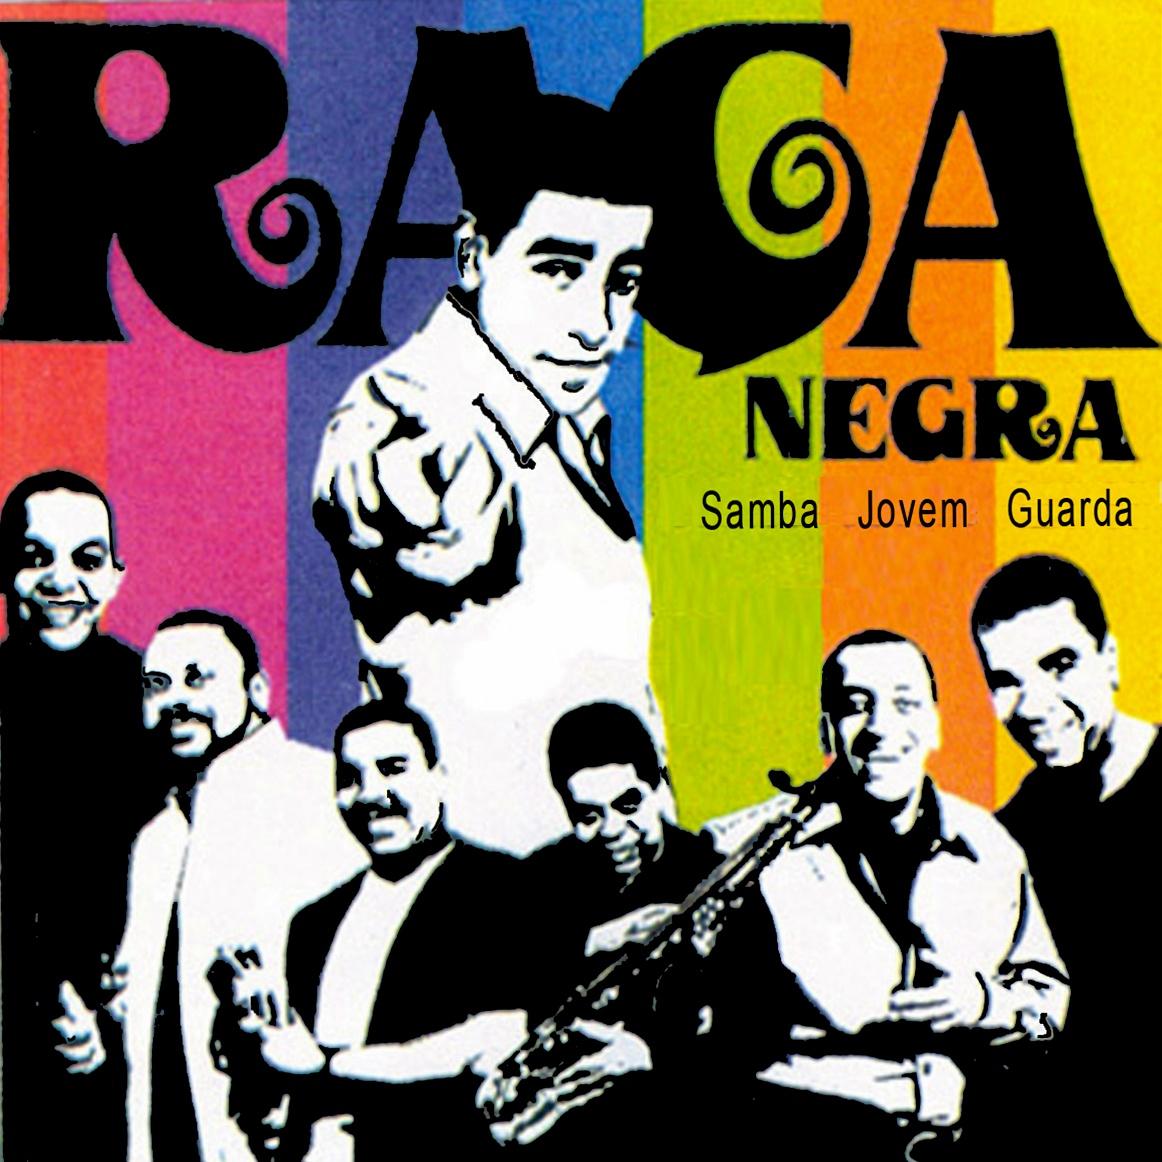 Ra�a Negra - Samba Jovem Guarda